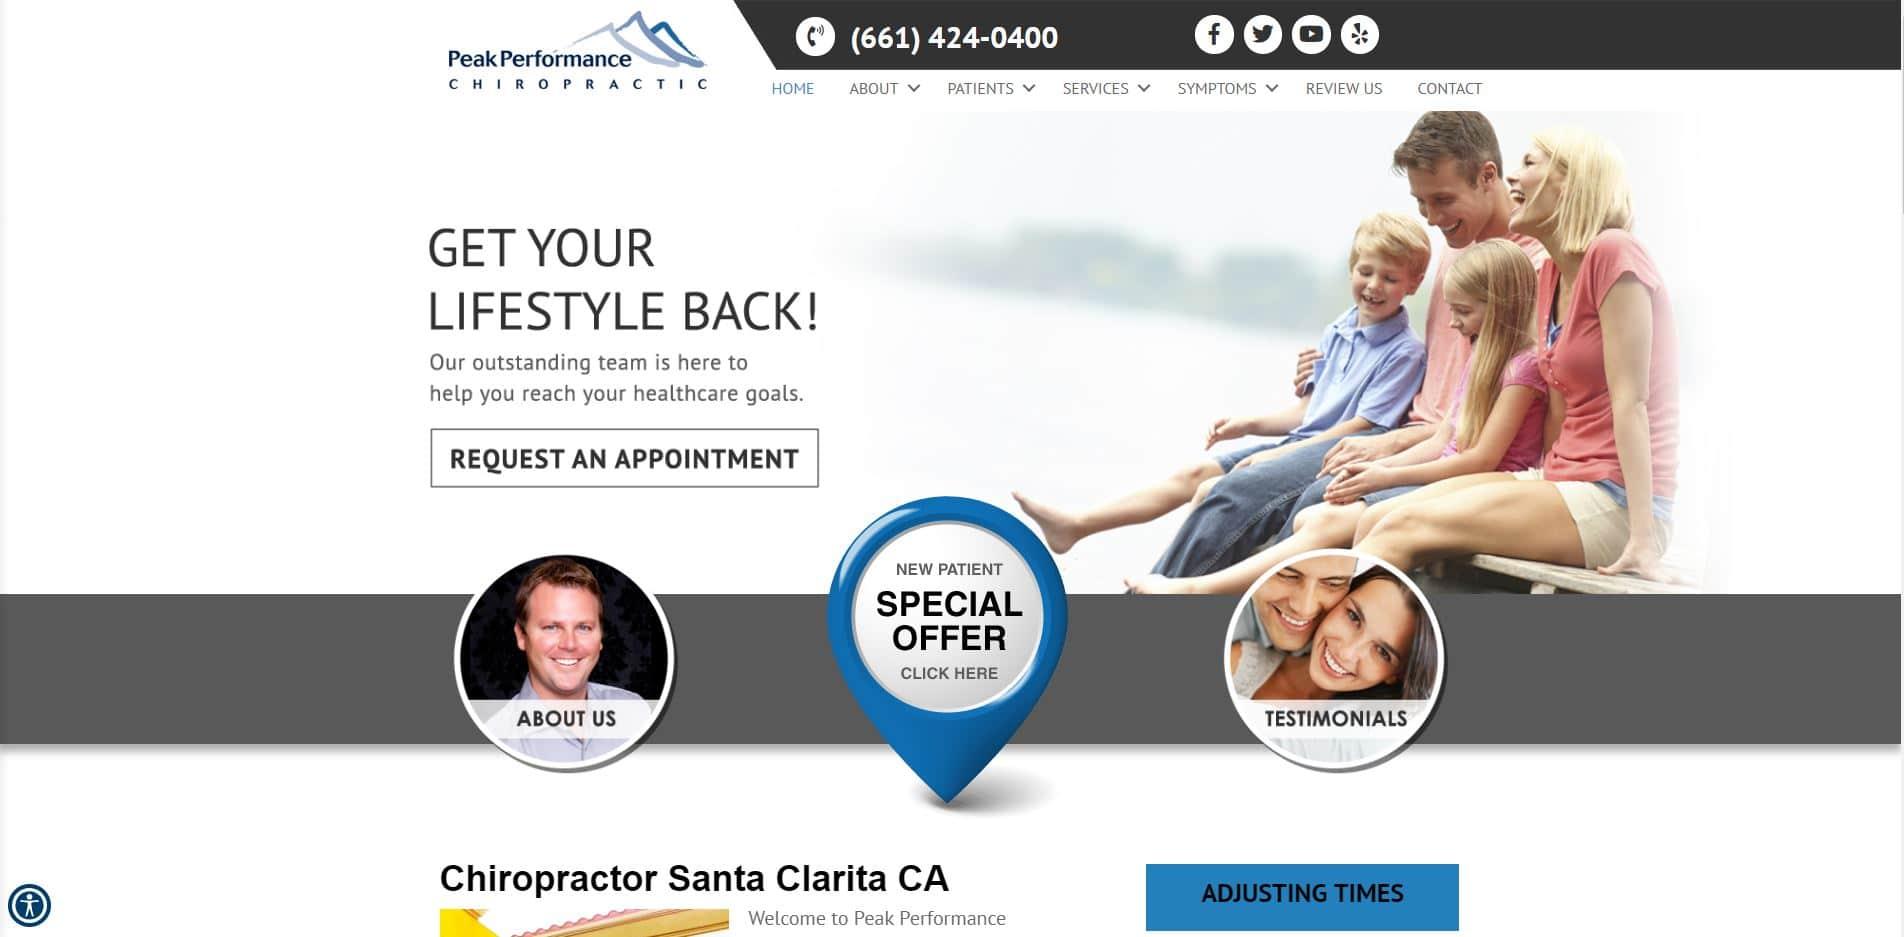 Chiropractor in Santa Clarita